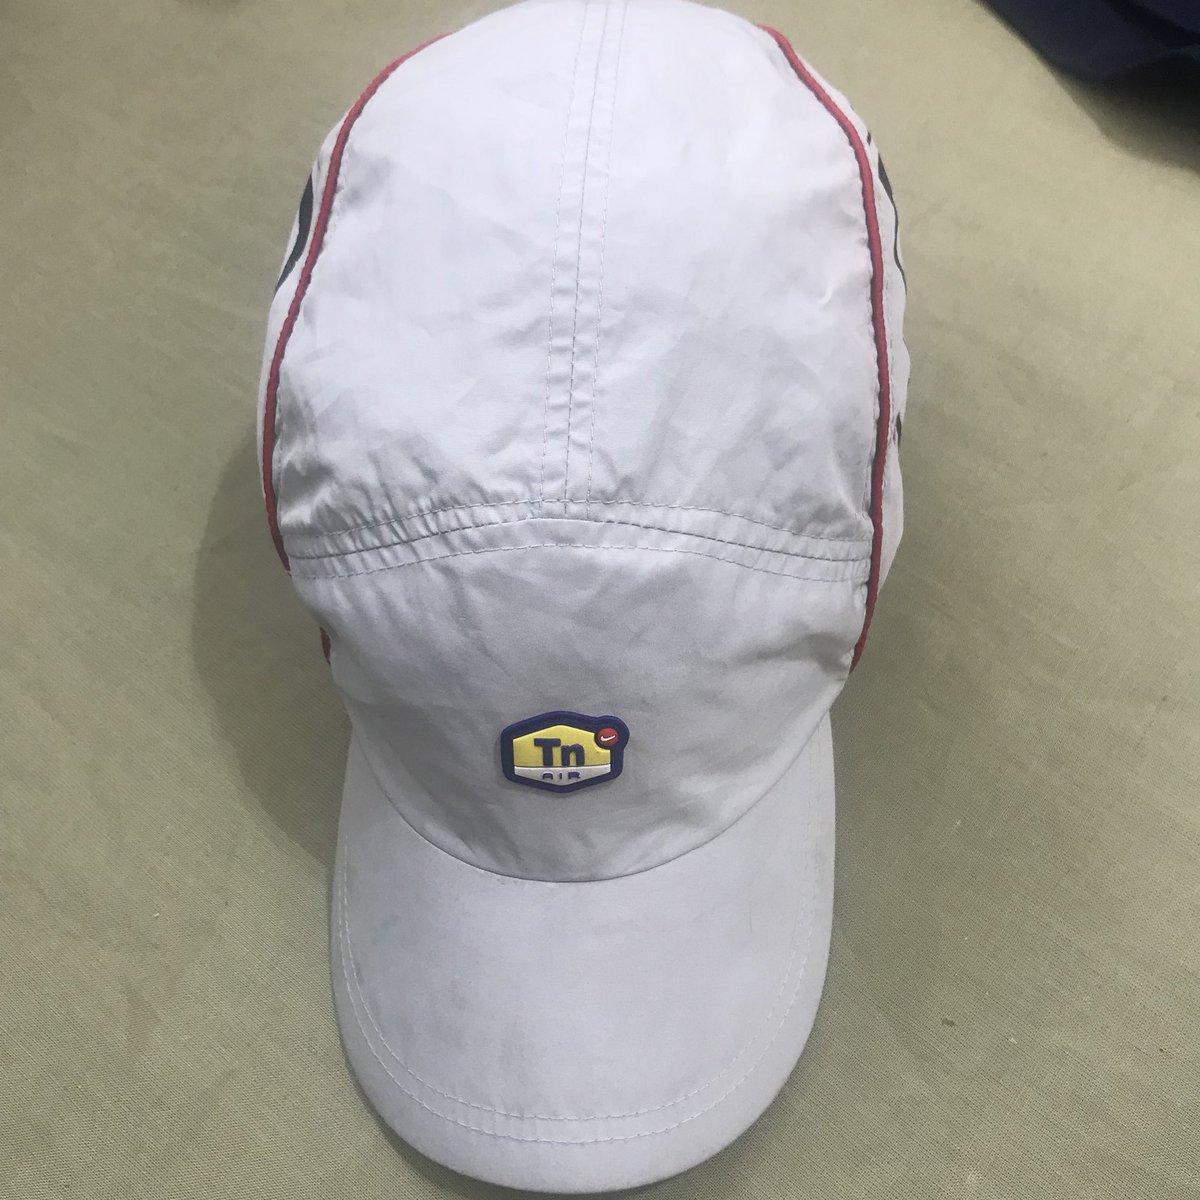 ...  SK  SKAir  Skepta  Nike  NikeLDN  LDN  NikeUK  NikeUS  Hat  Hats   Accessories  Caps  Sport  PoloSport  Italy  Italian  Menswear  Streetwear   Vintage ... a05c79160d1